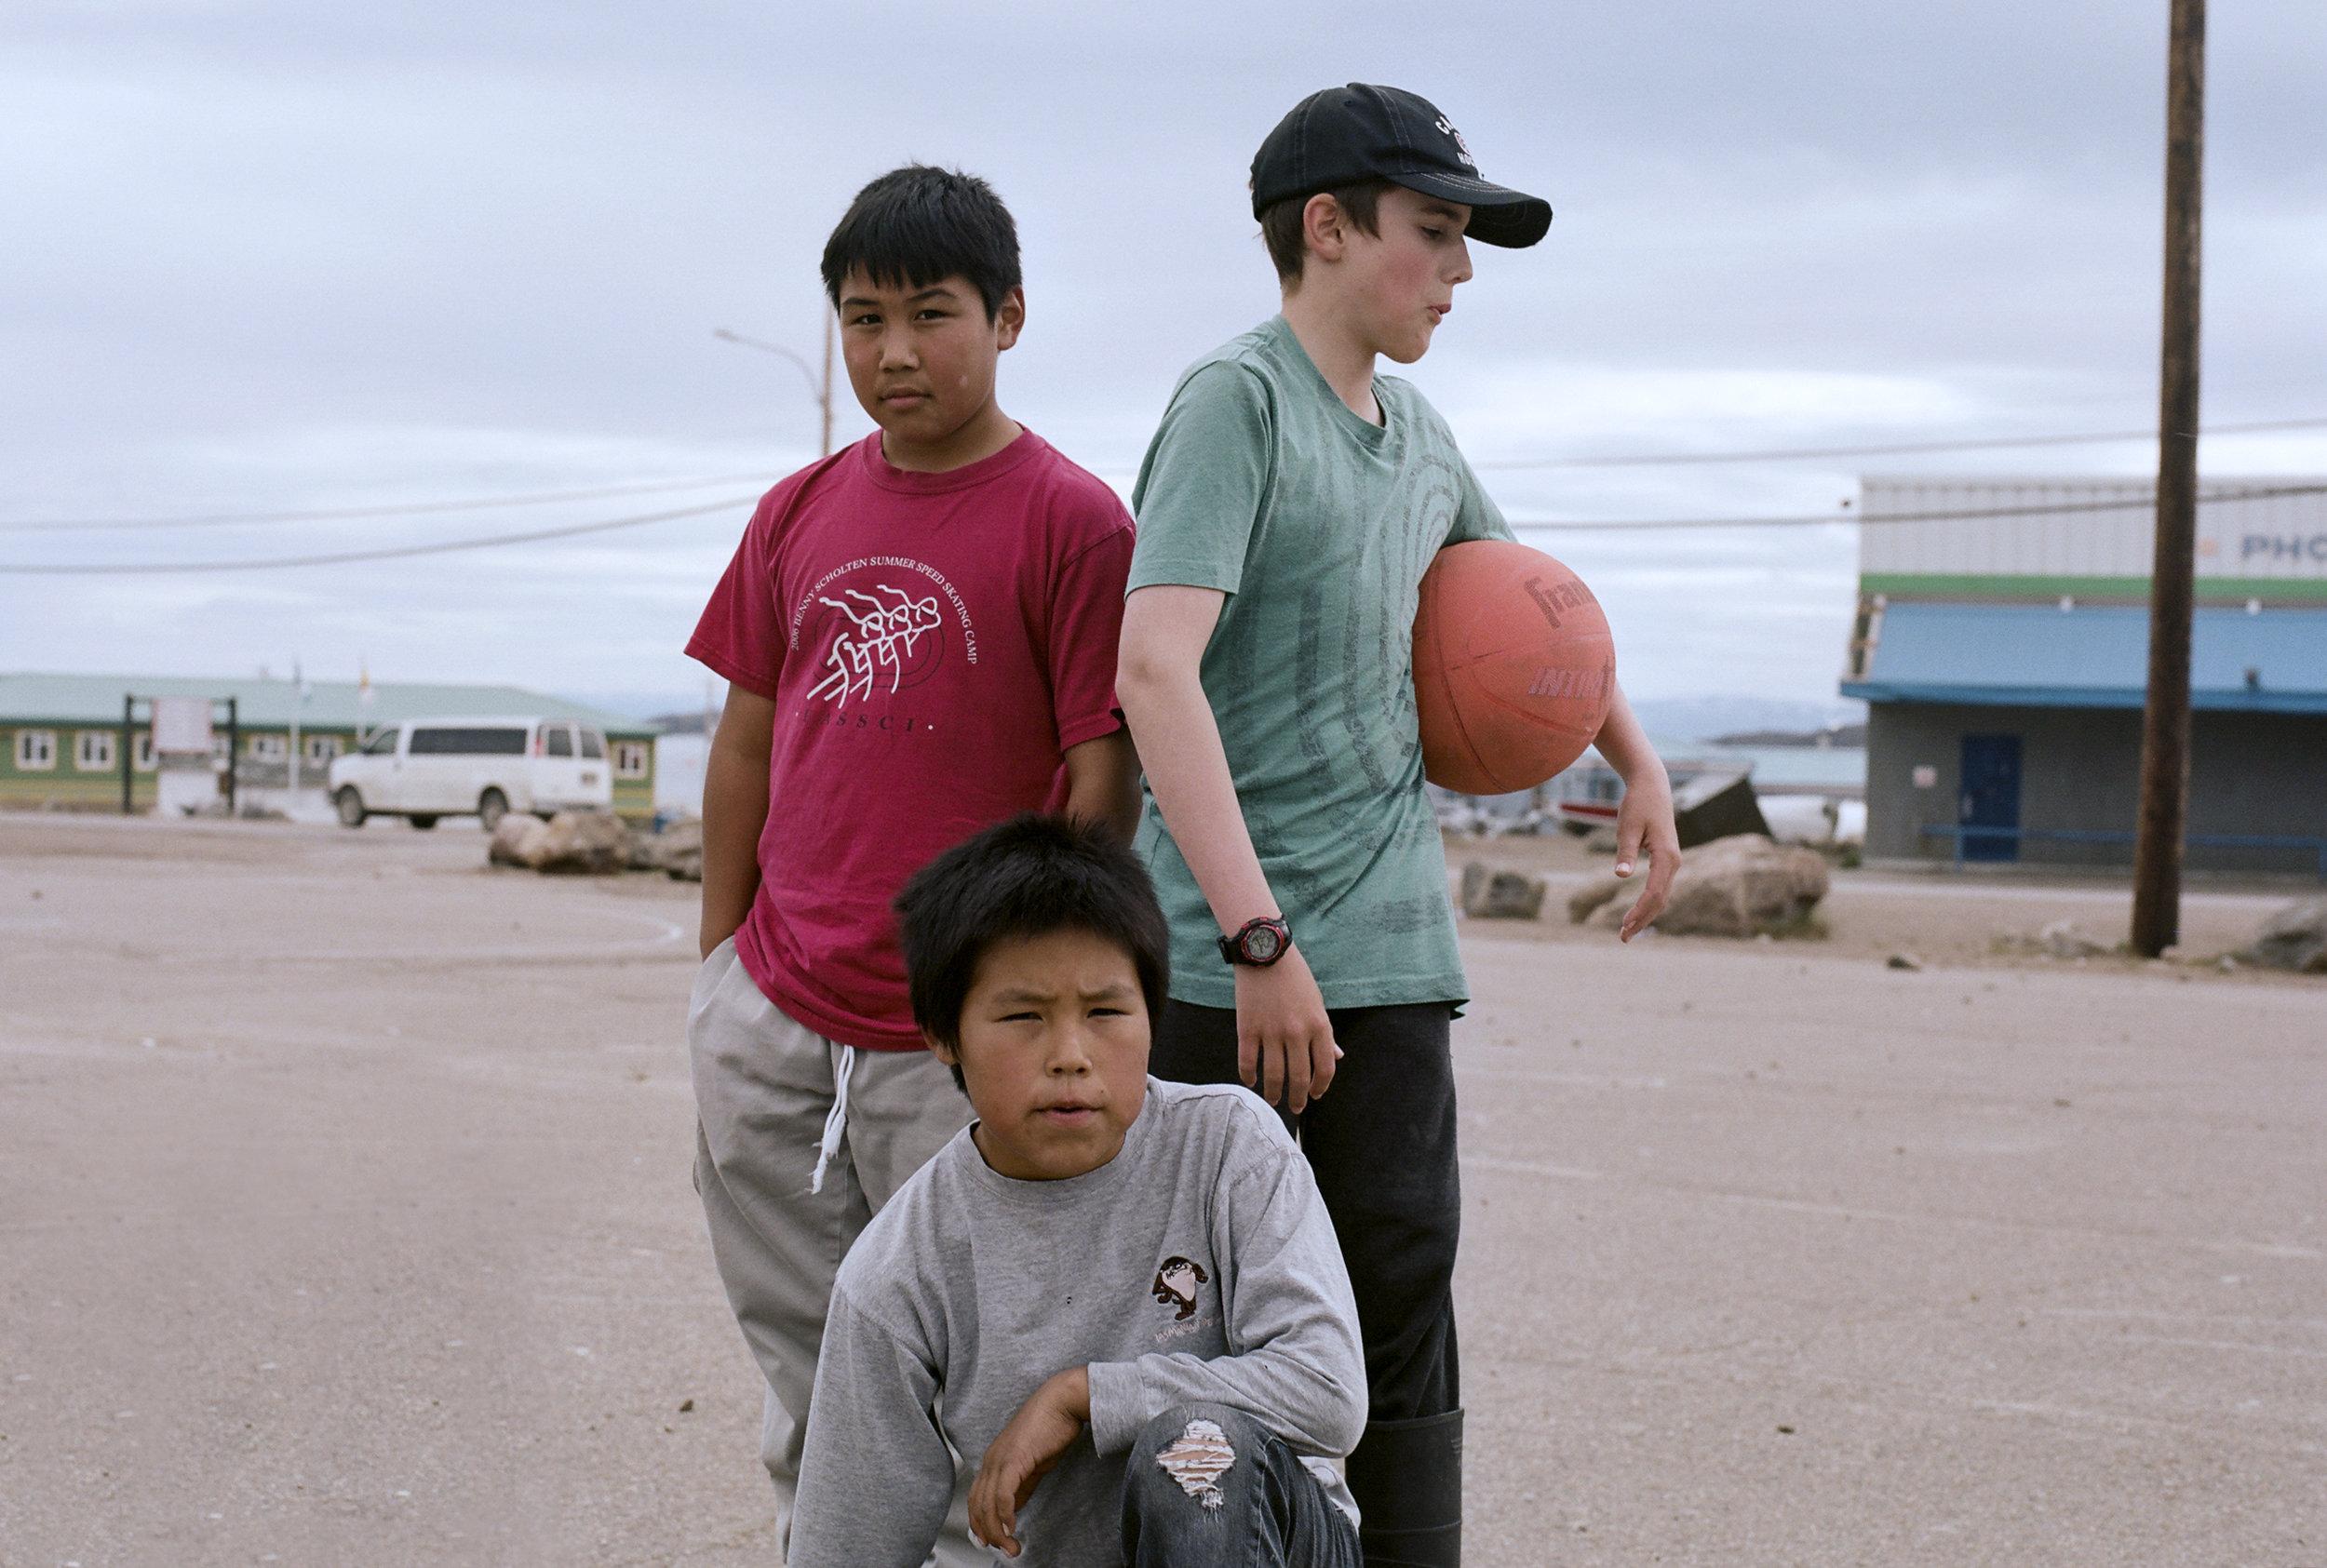 basketball/canada